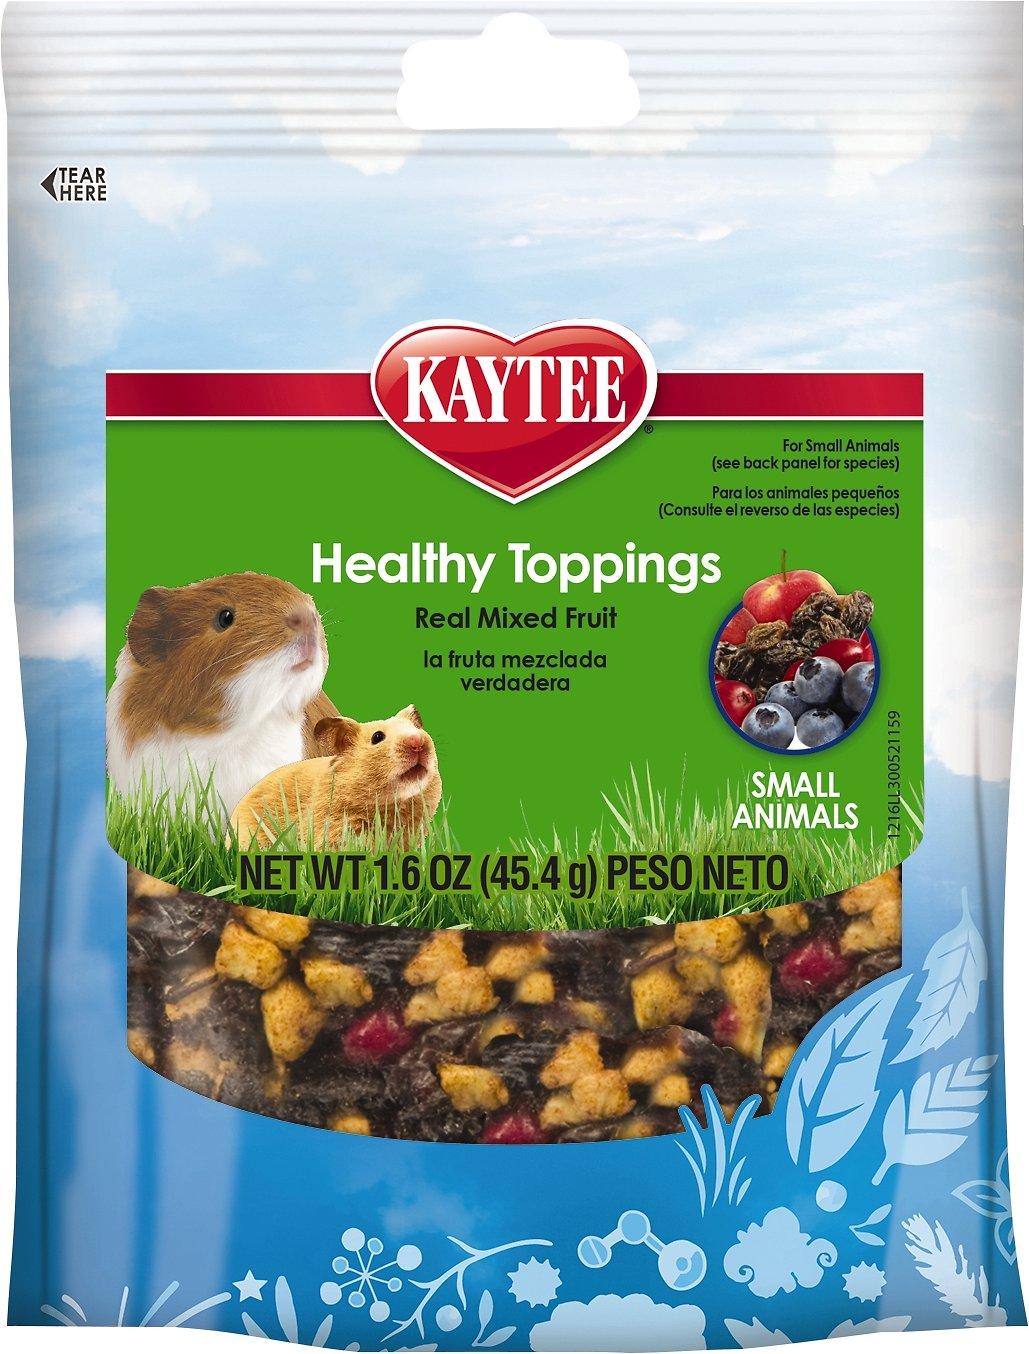 Kaytee Fiesta Healthy Toppings Mixed Fruit Small Animal Treats, 1.6-oz bag